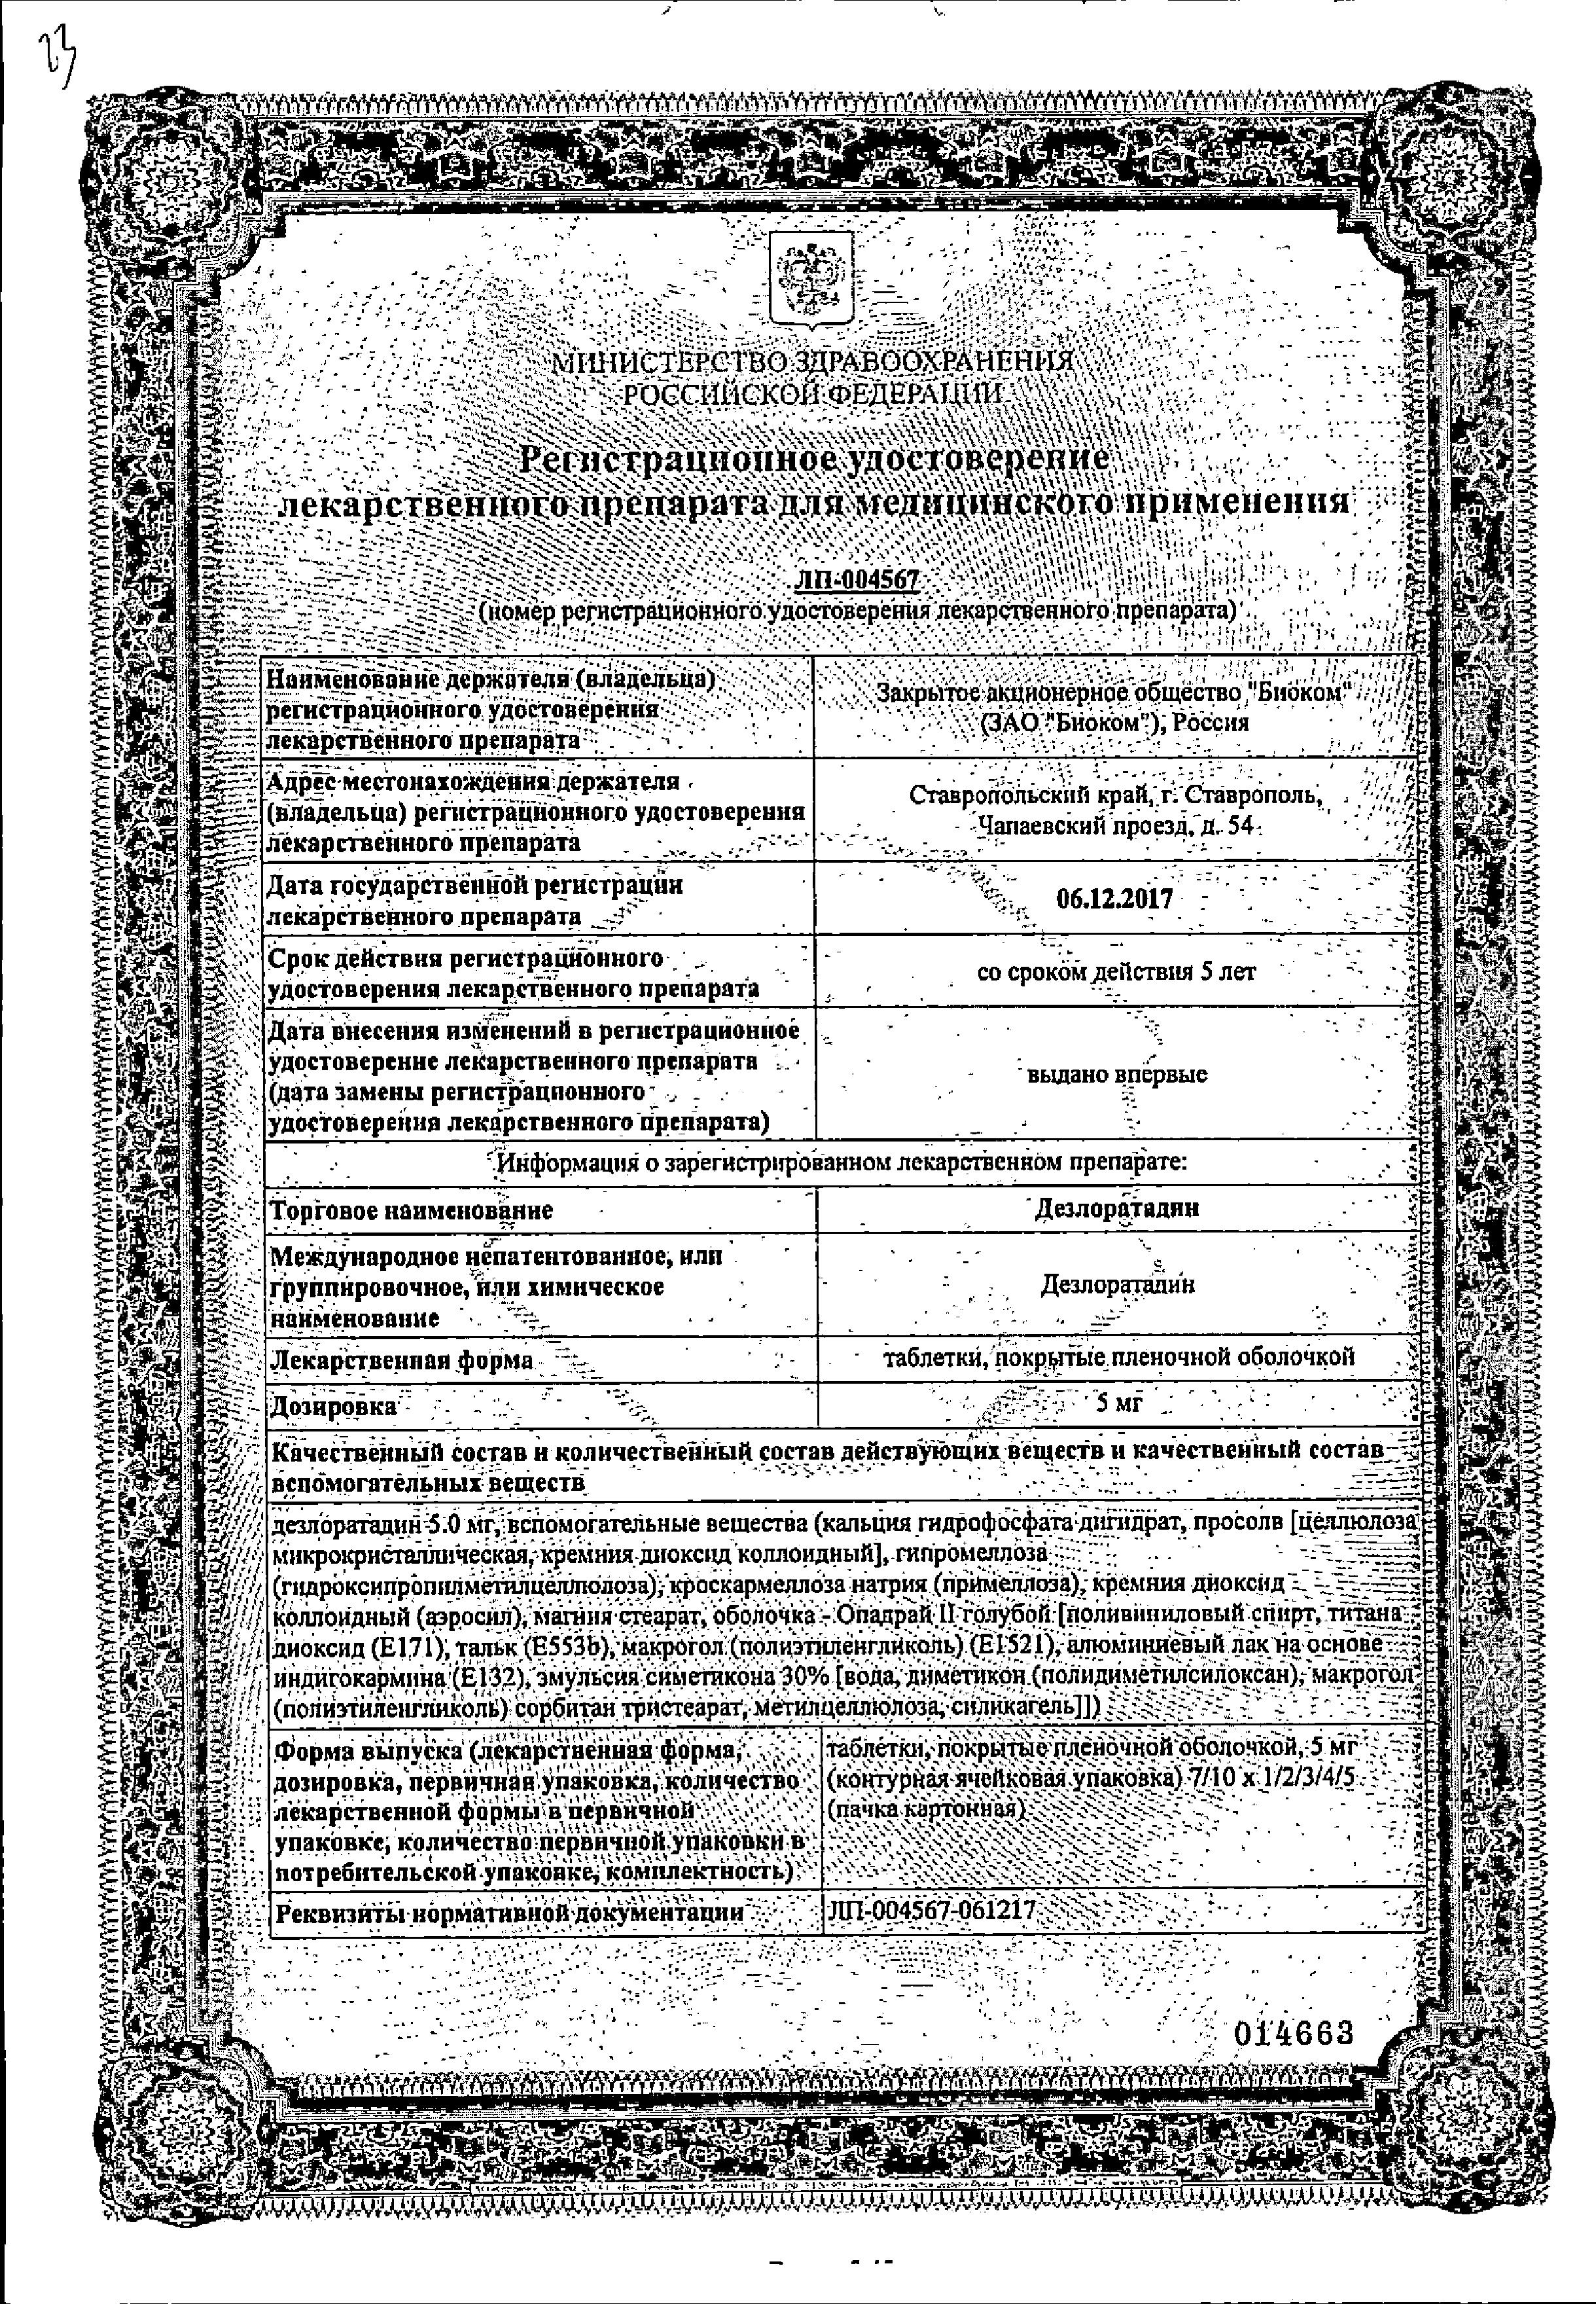 Дезлоратадин сертификат